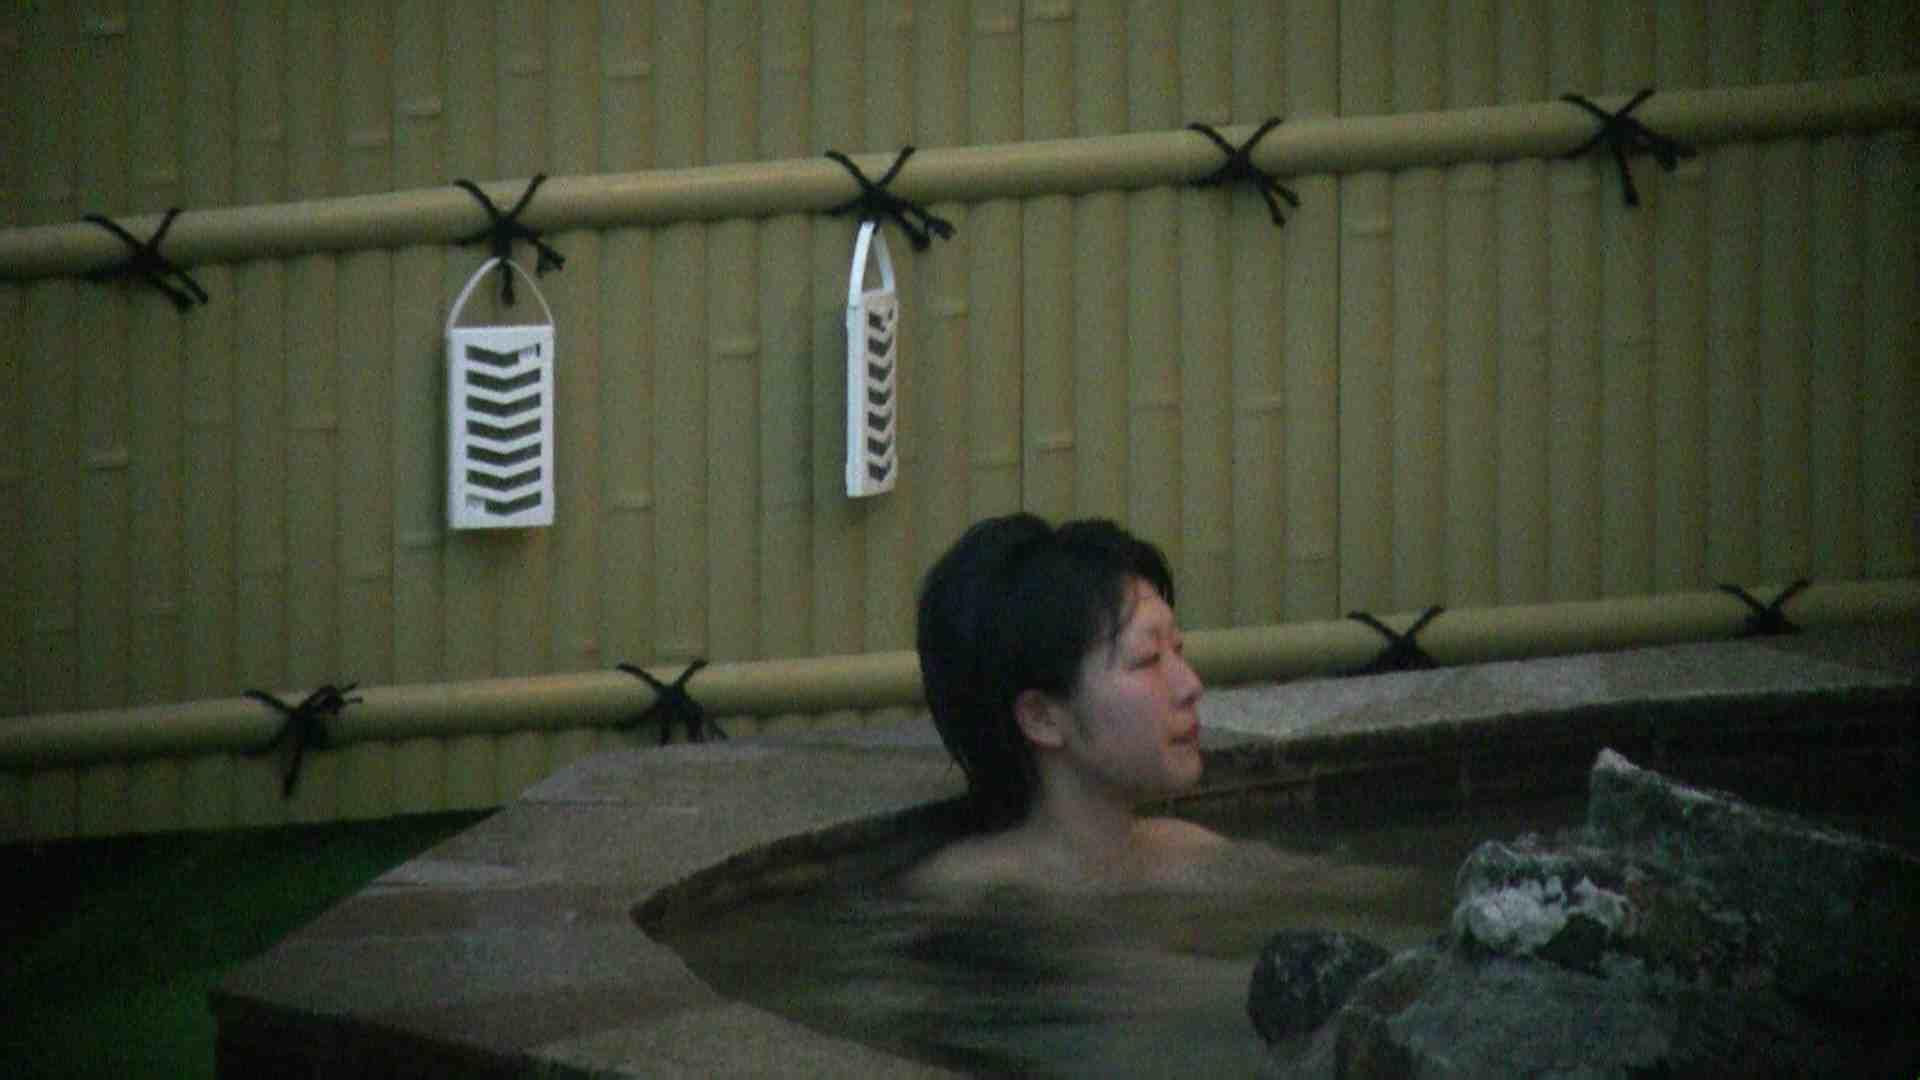 Aquaな露天風呂Vol.05【VIP】 露天風呂編 | 盗撮シリーズ  112PIX 51